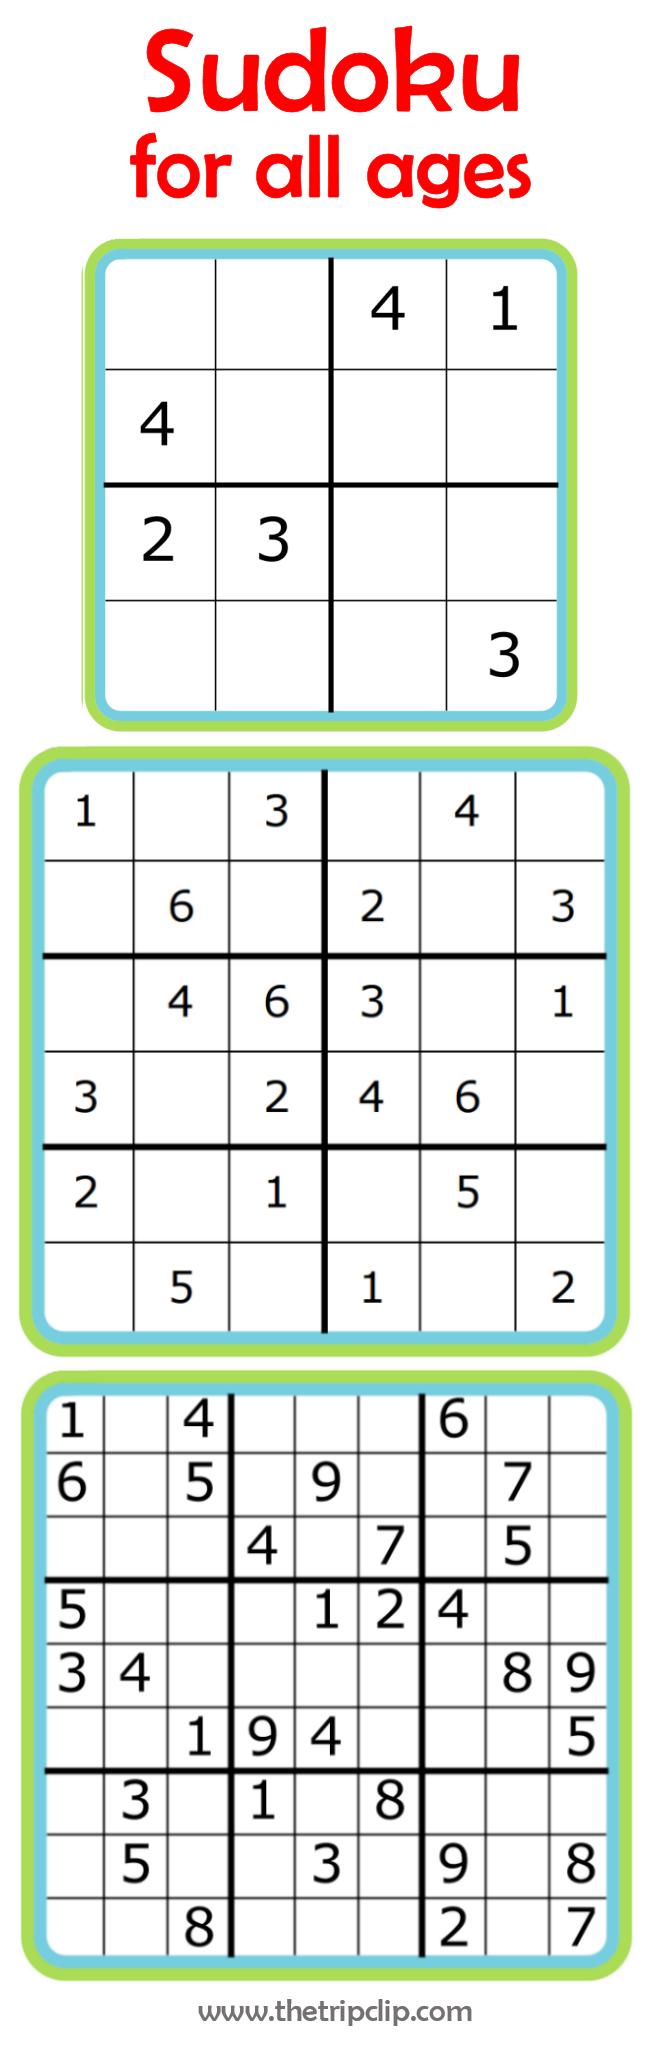 Week 7 Learning Math with Sudoku Sudoku puzzles, Math